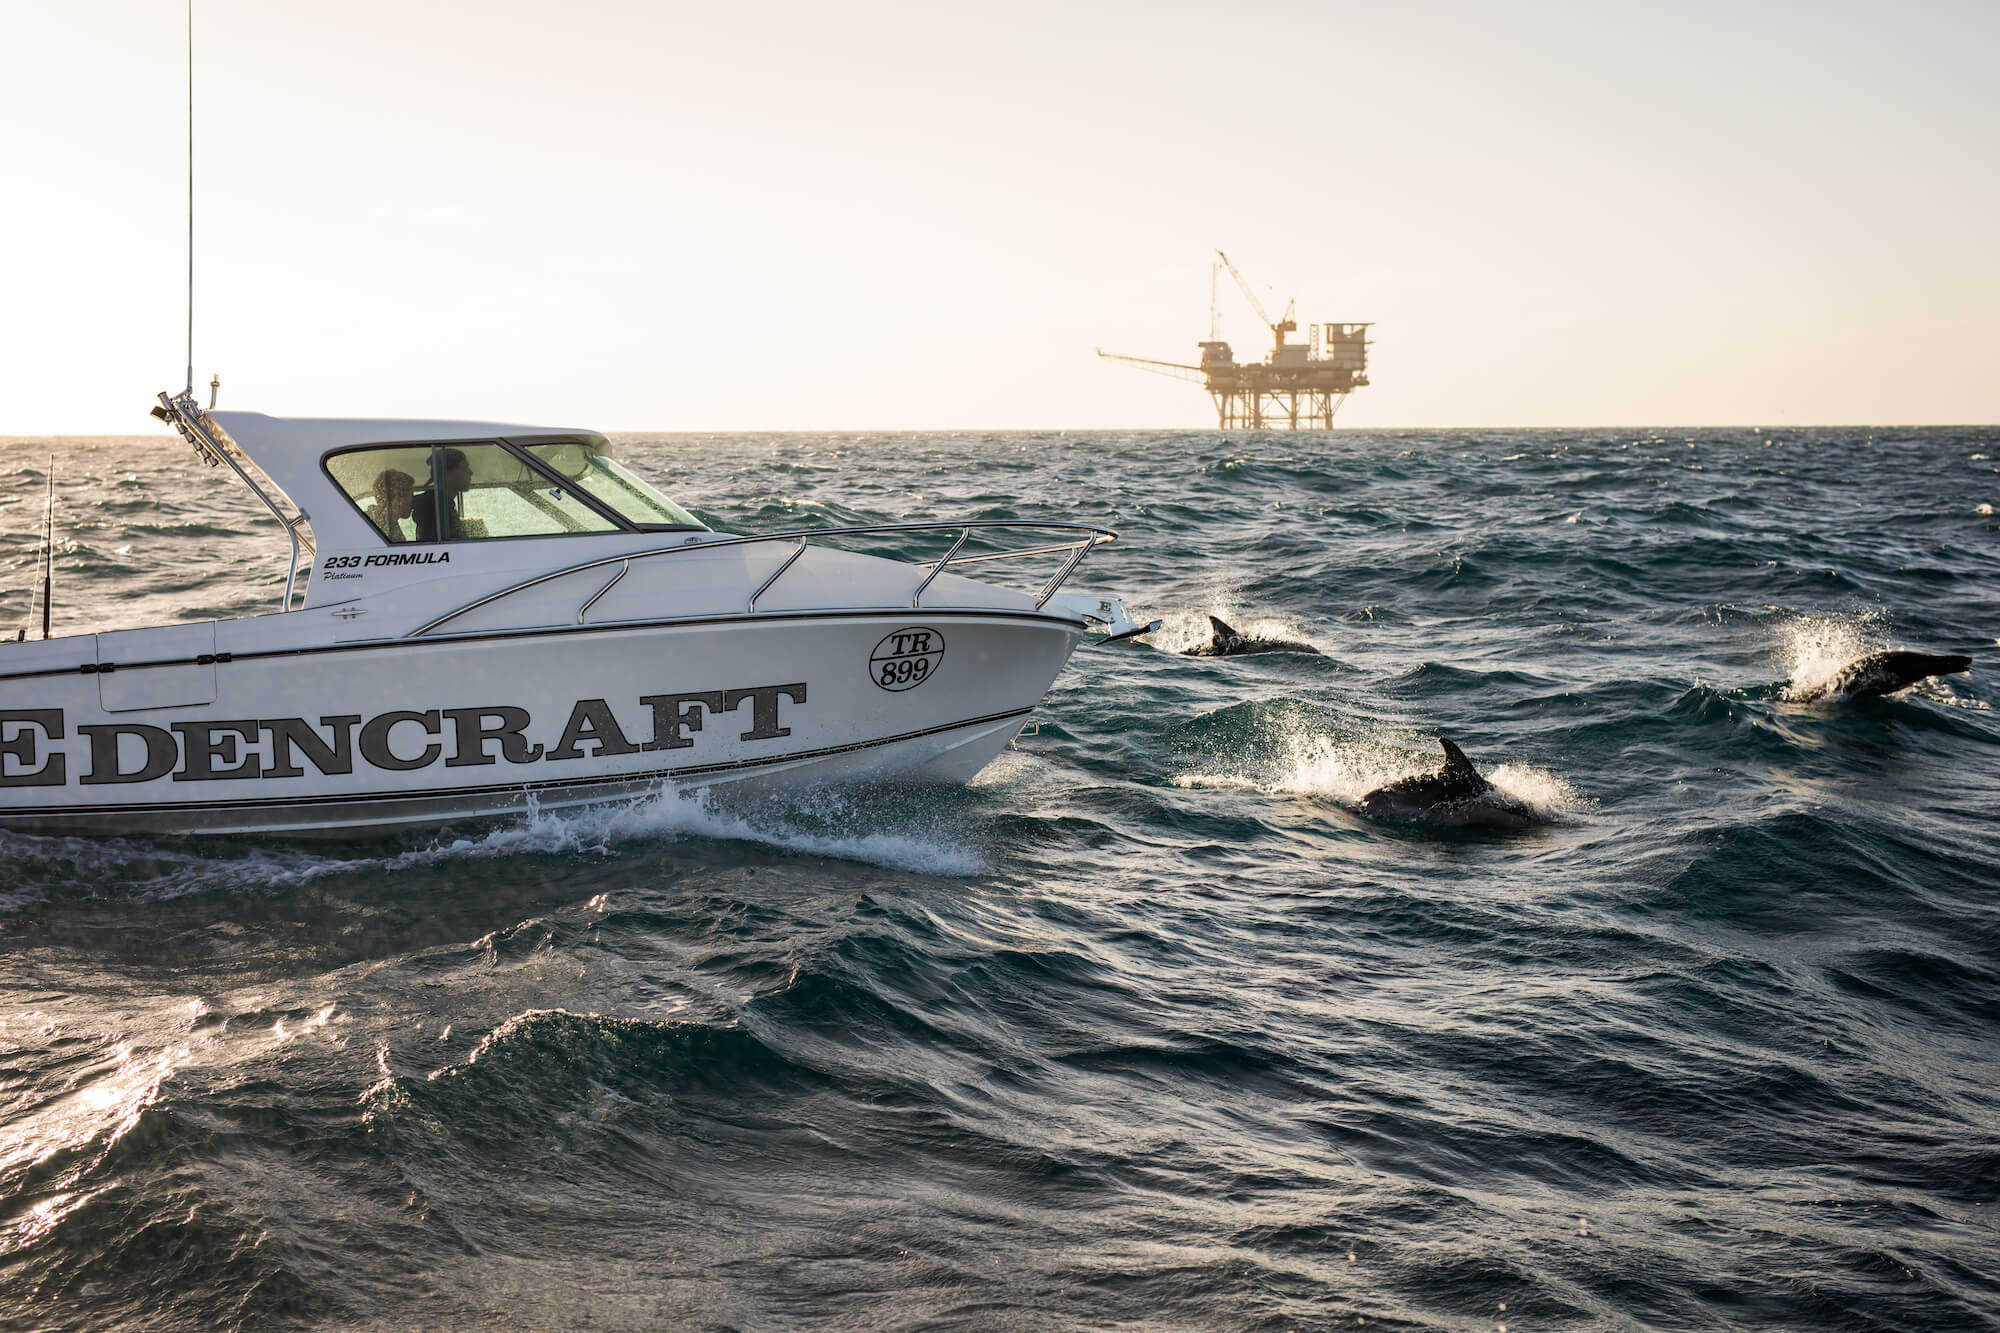 Edencraft 233 Formula PlatinumDolphins swim alongside an Edencraft 233 Formula Platinum offshore